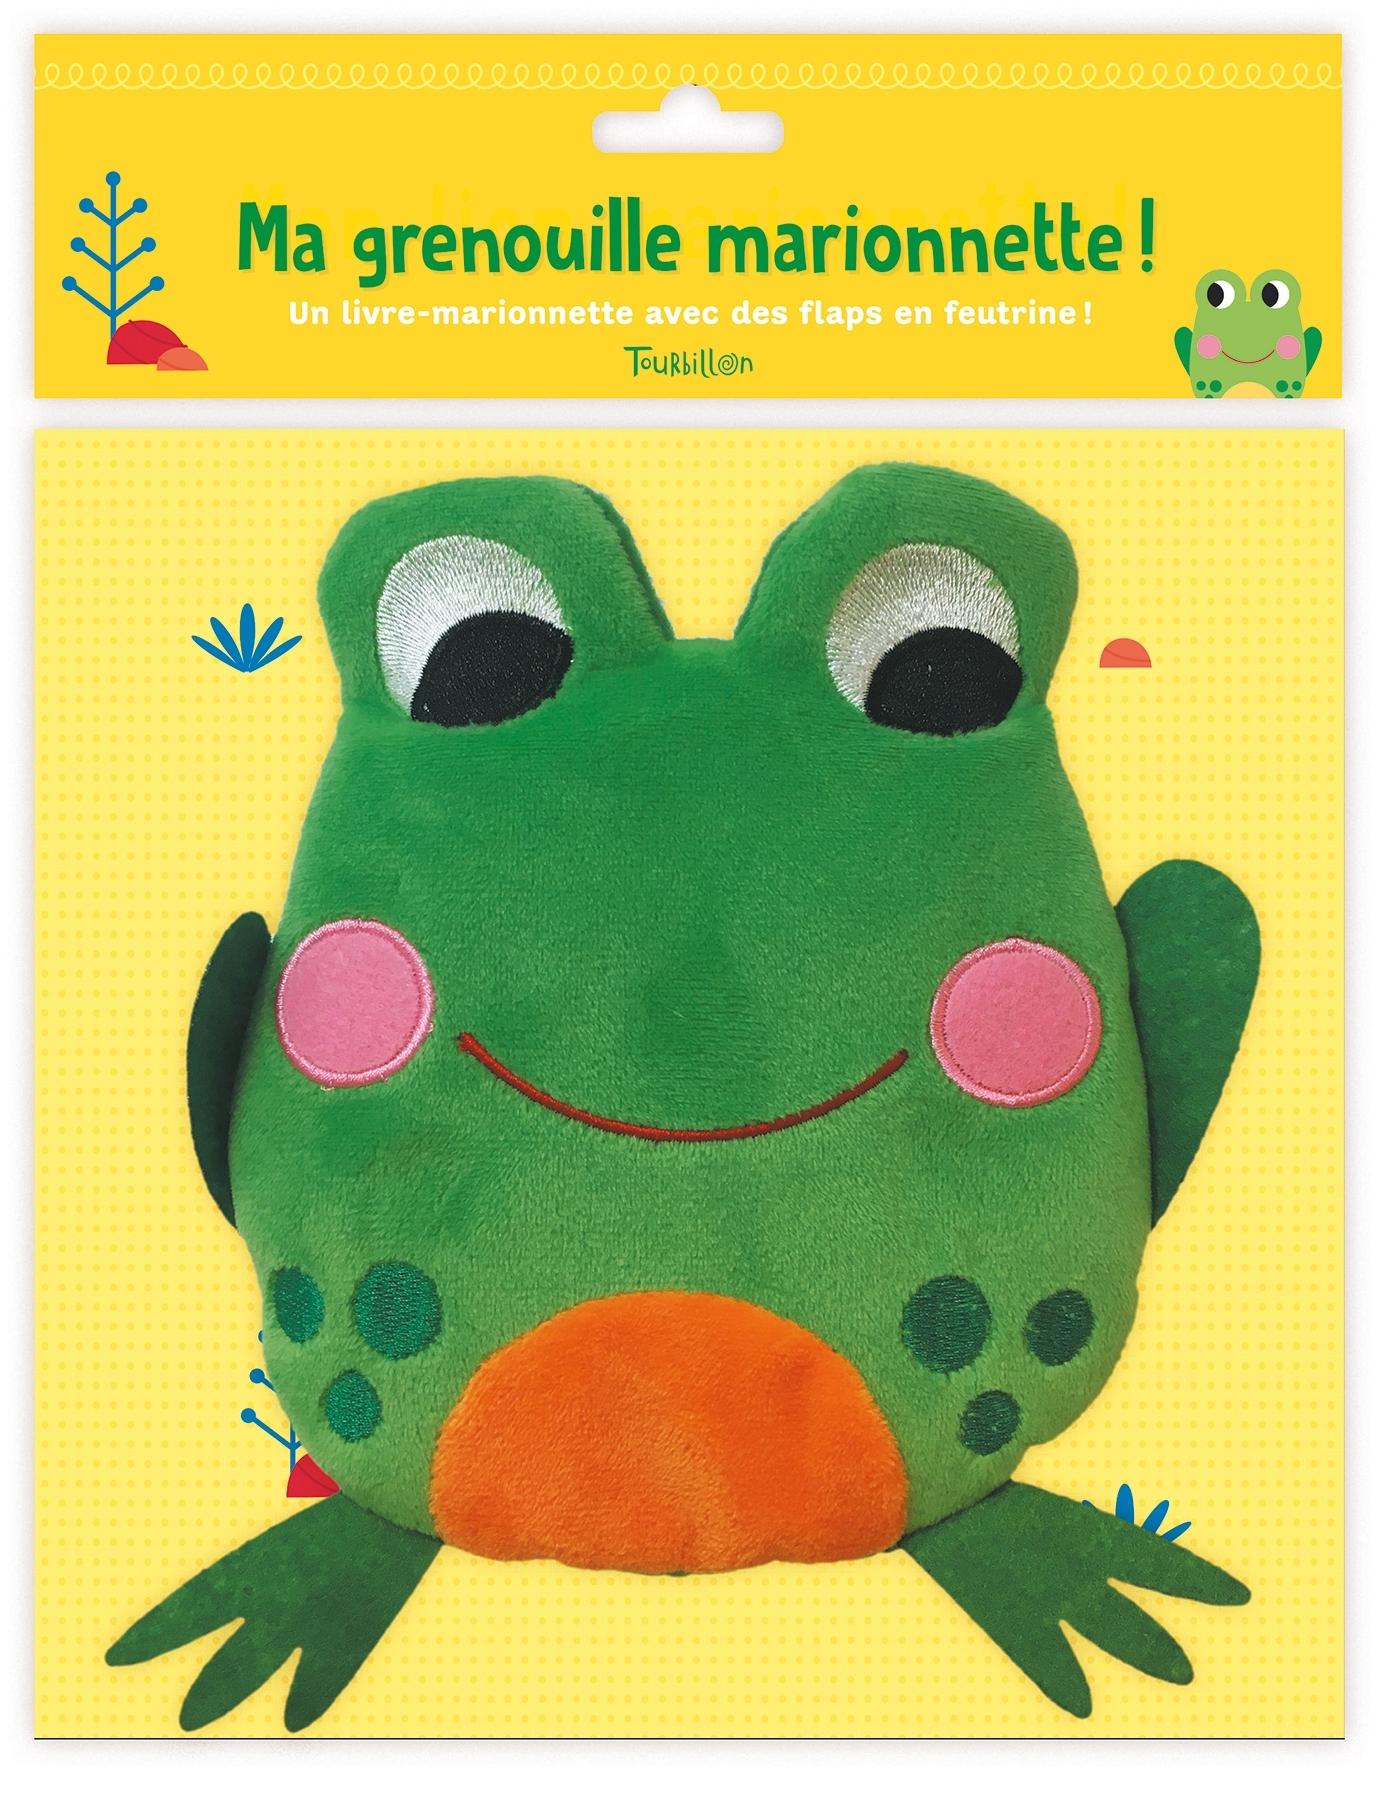 MA GRENOUILLE MARIONNETTE